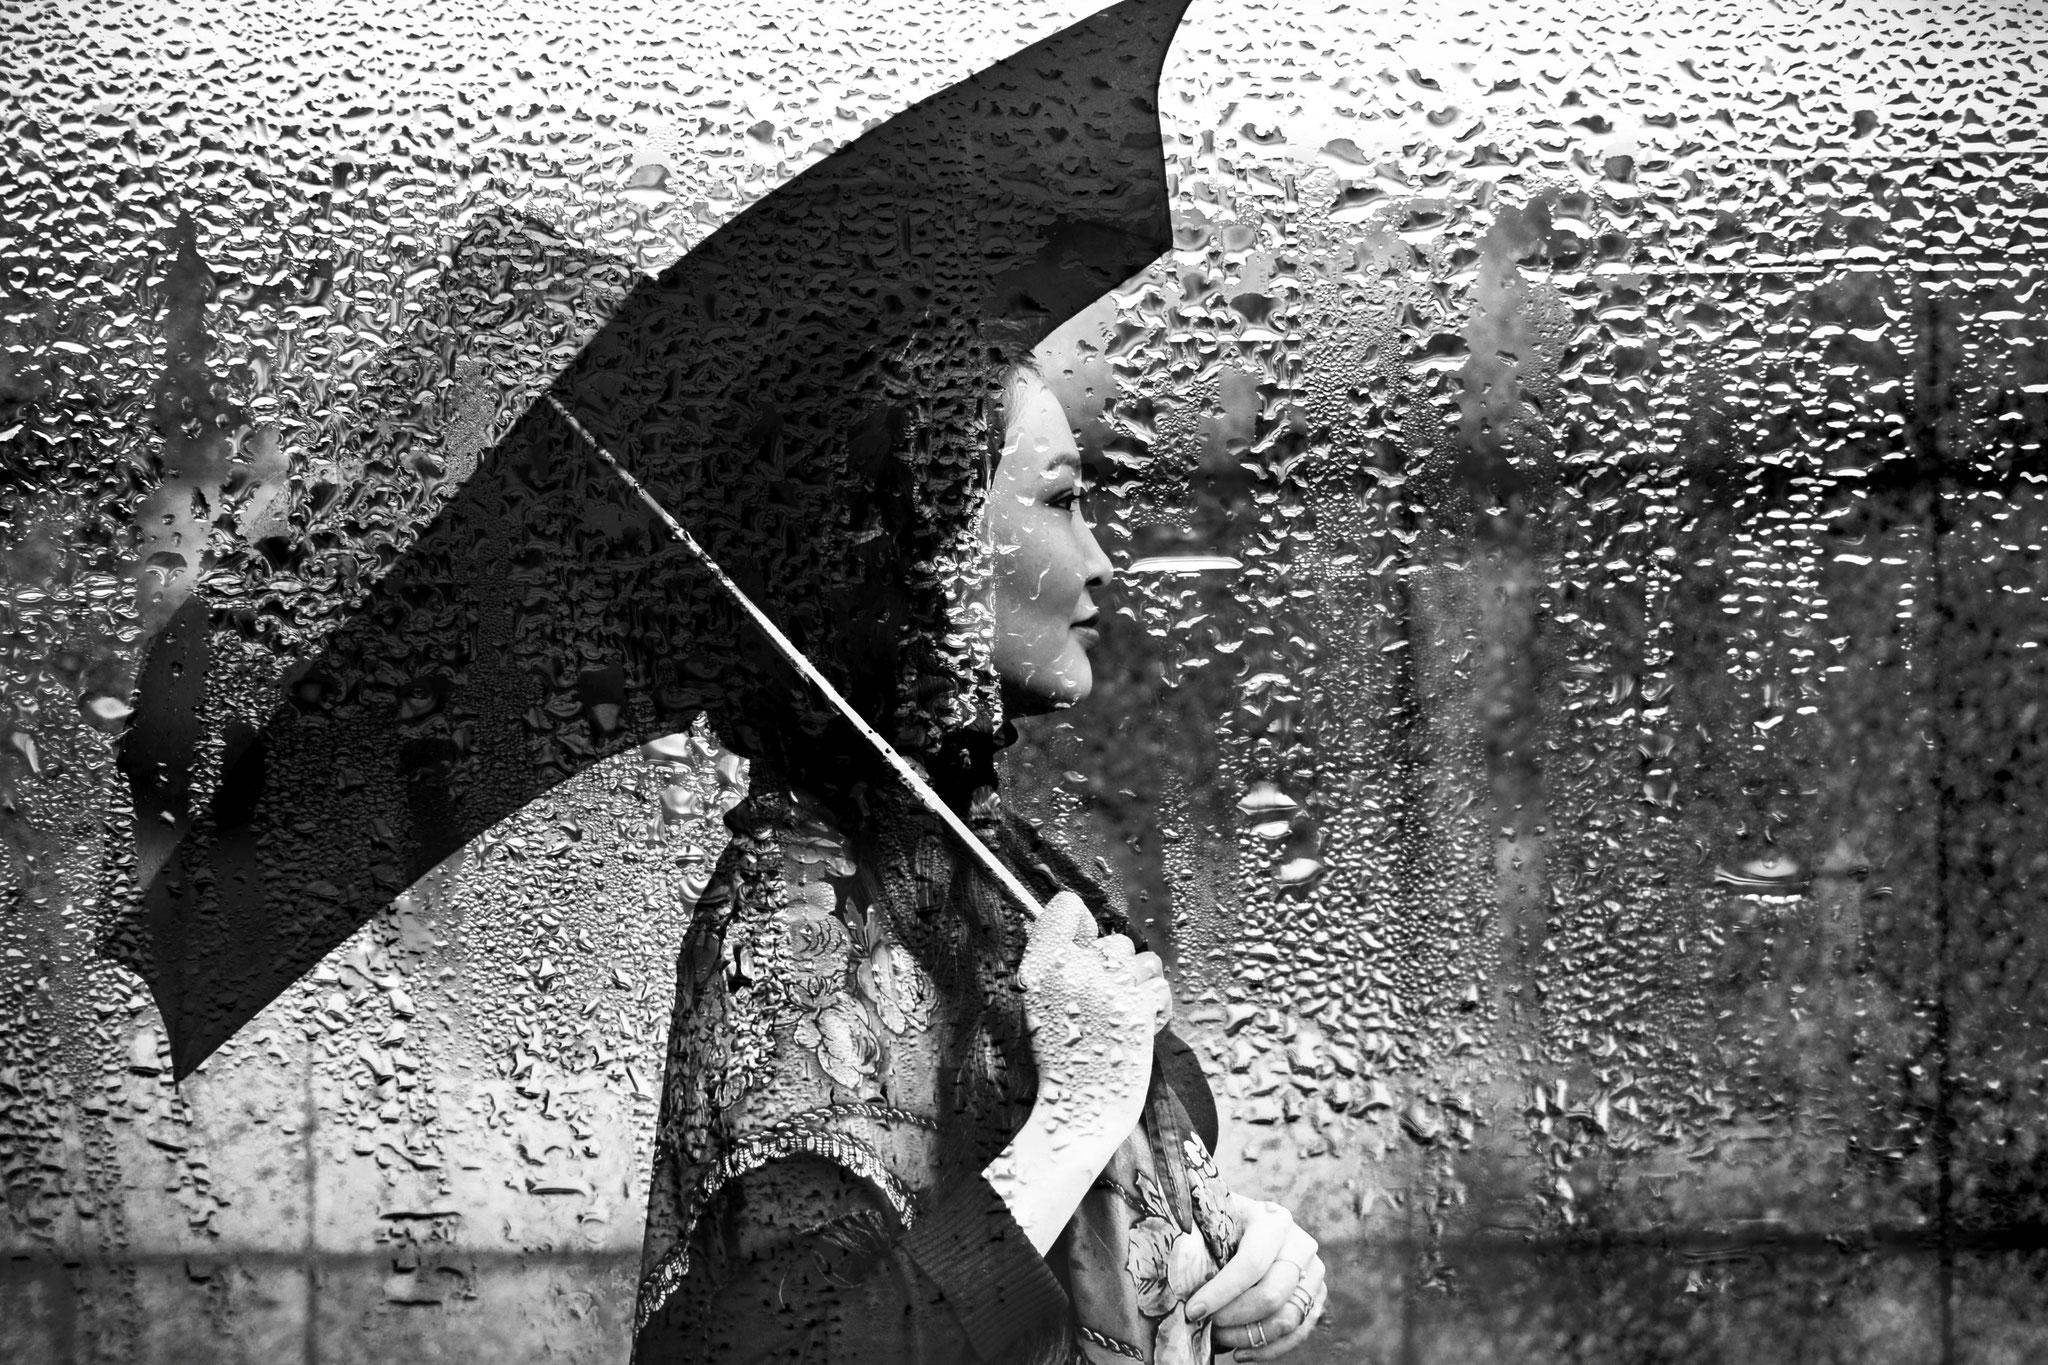 Monika Sandrová (Czeh Repoublic) - In the rain